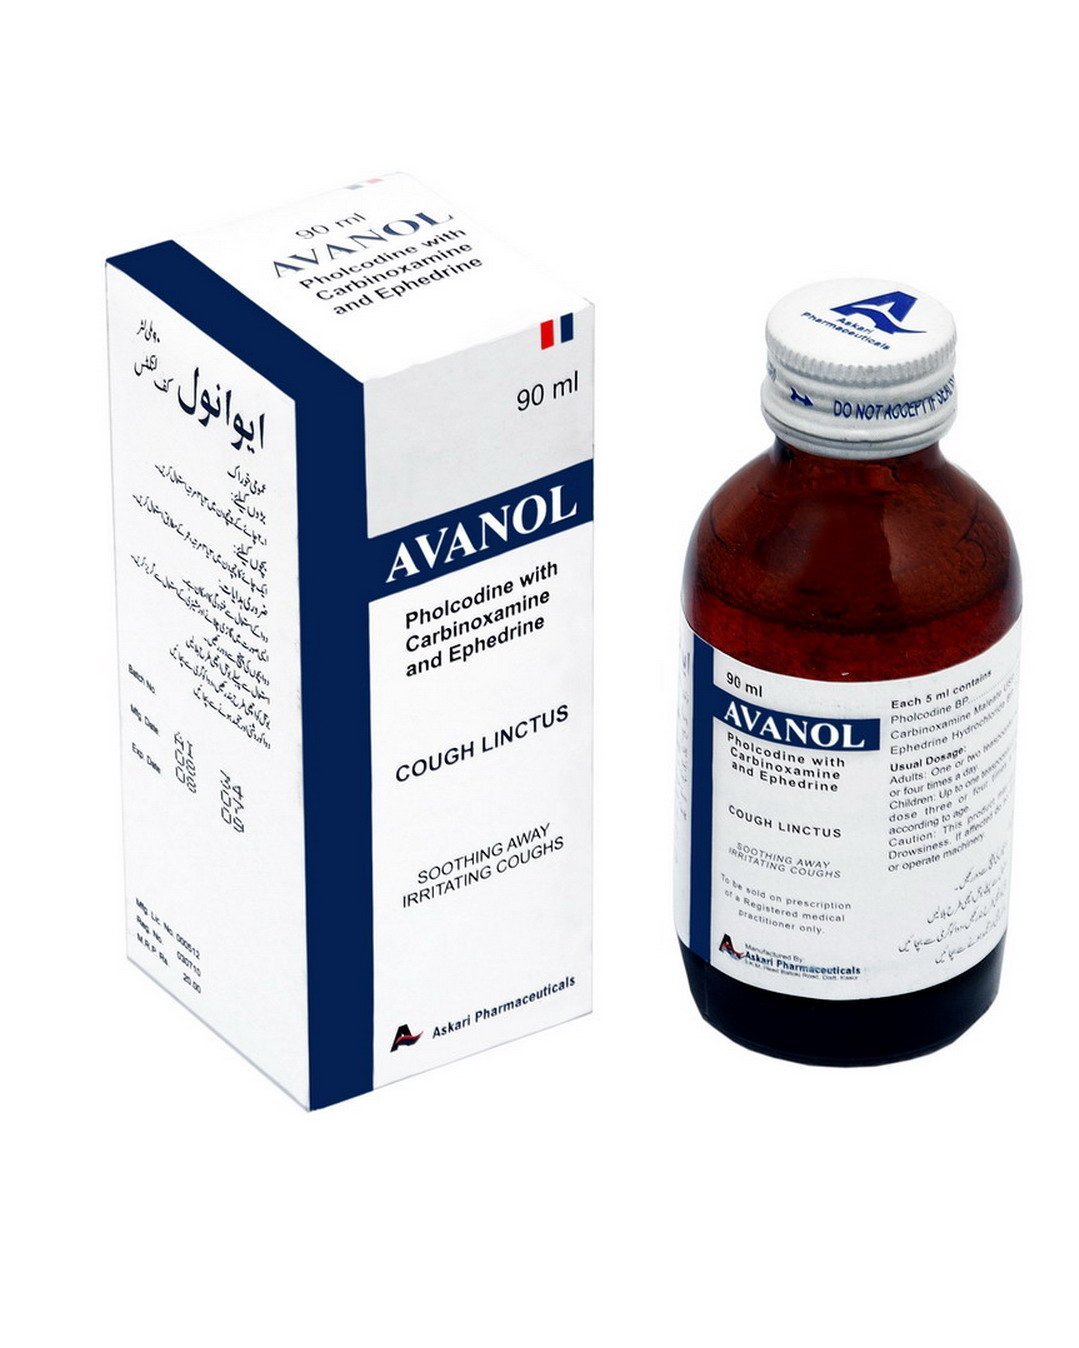 Ciprofloxacin (Cipro) for UTI: Dosage. - t